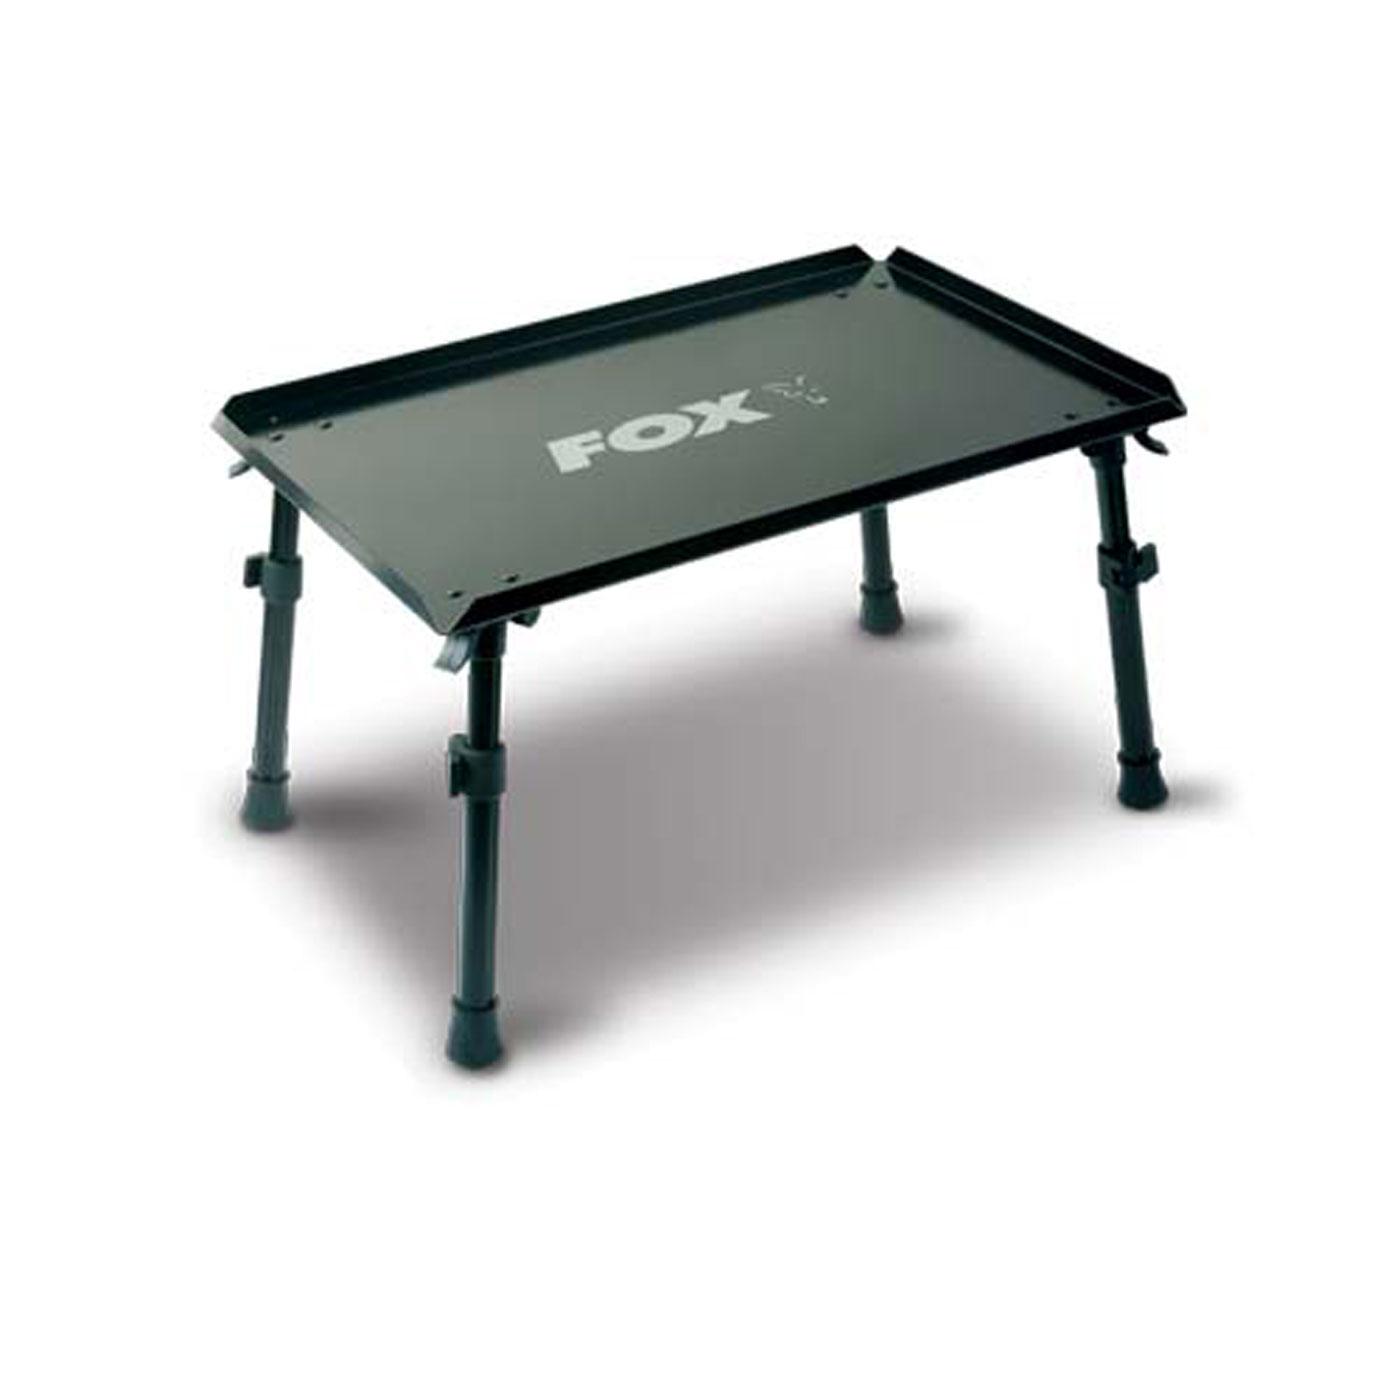 Chub Bivvy Table